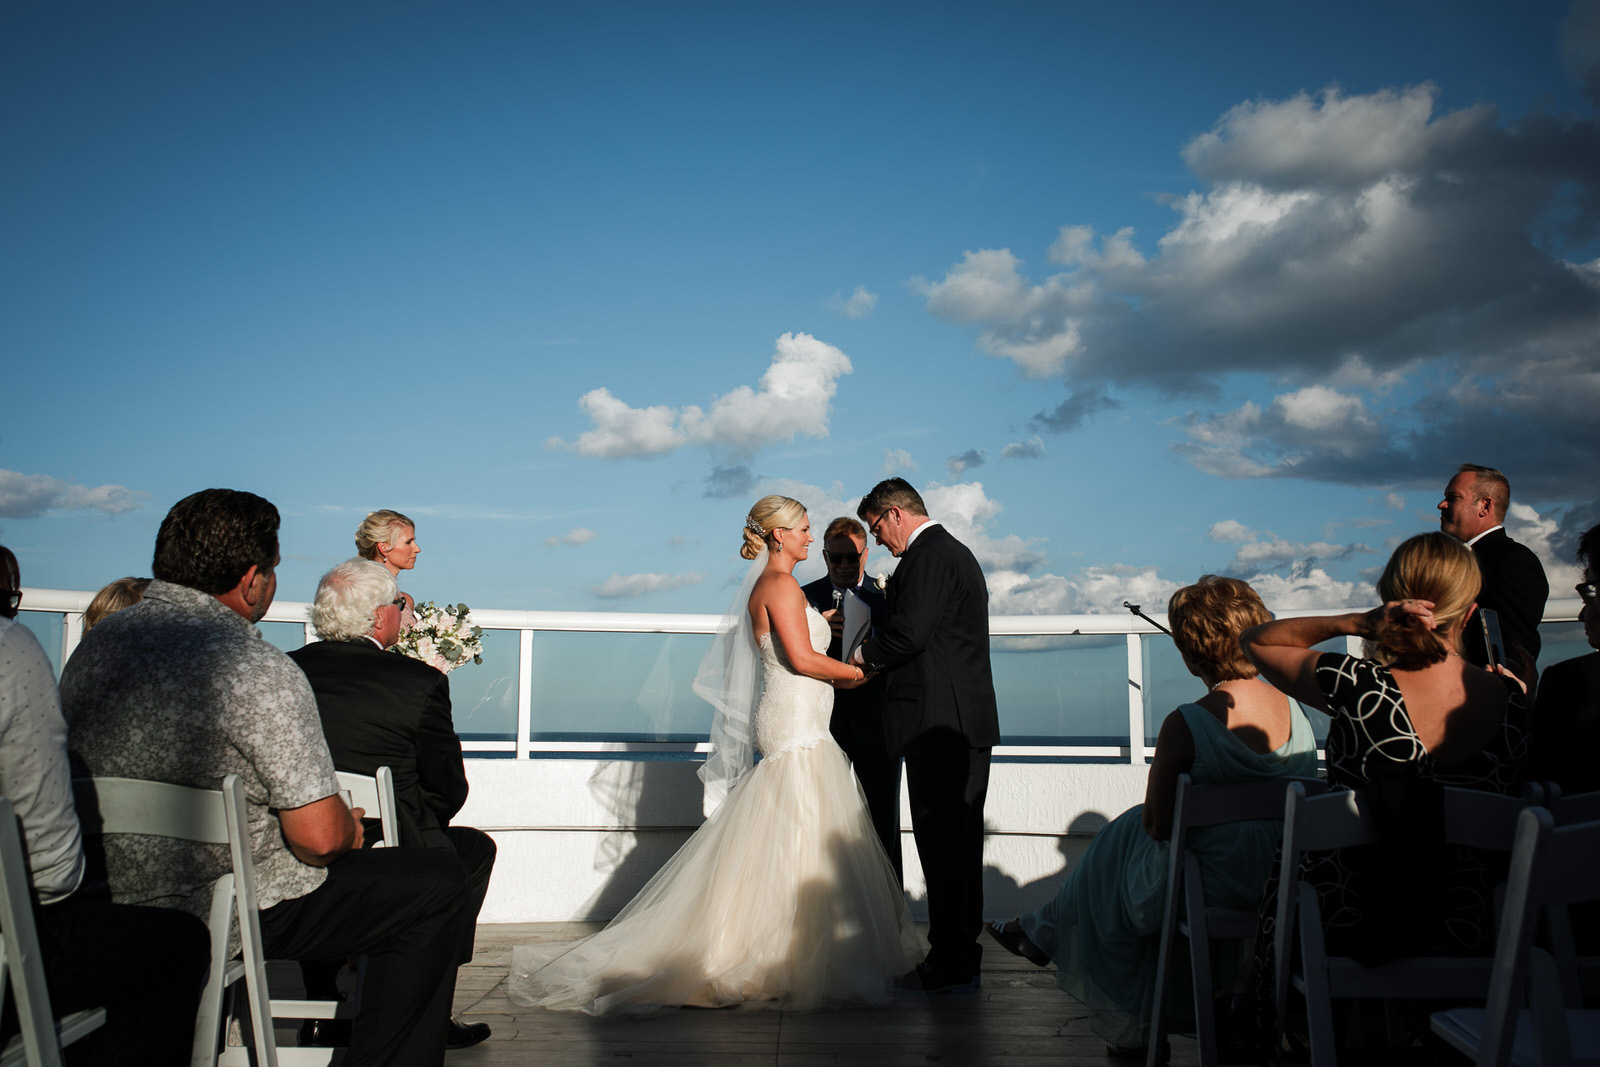 Christie-Tom-Wedding-Sonju-Photography-2018-179.JPG